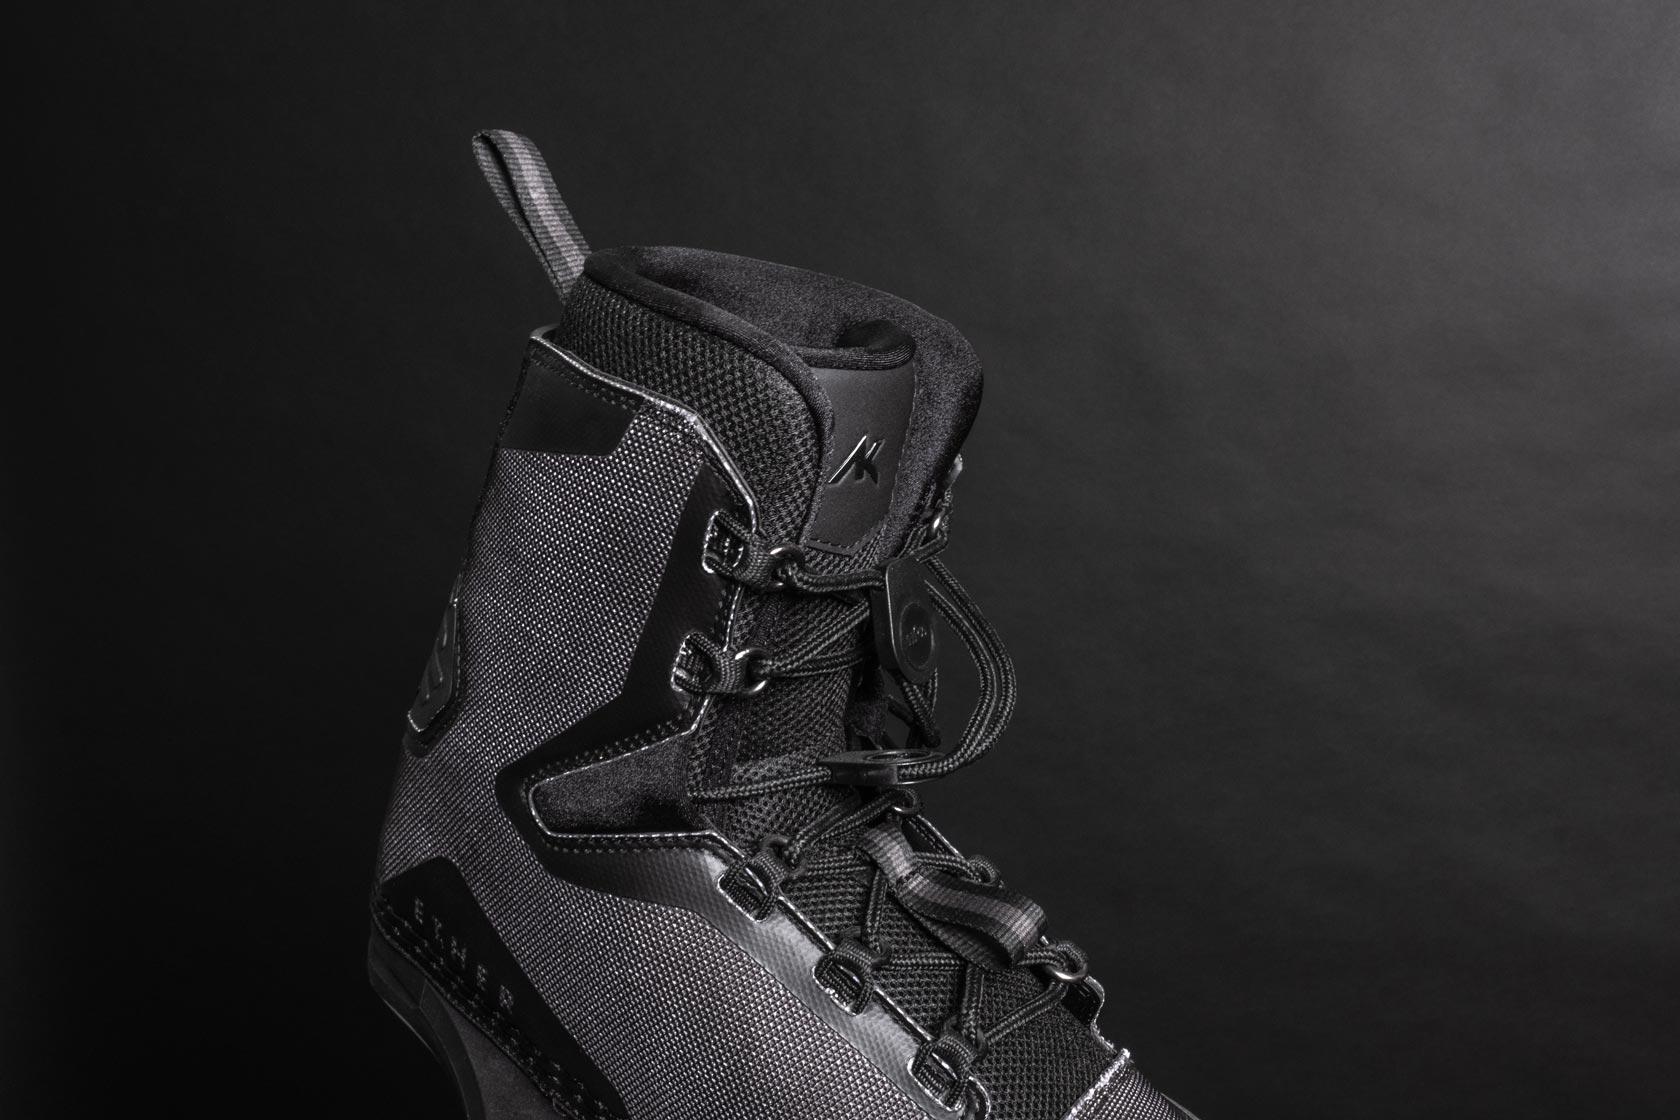 AK_Ether-Boot_High-Cut-Support-2